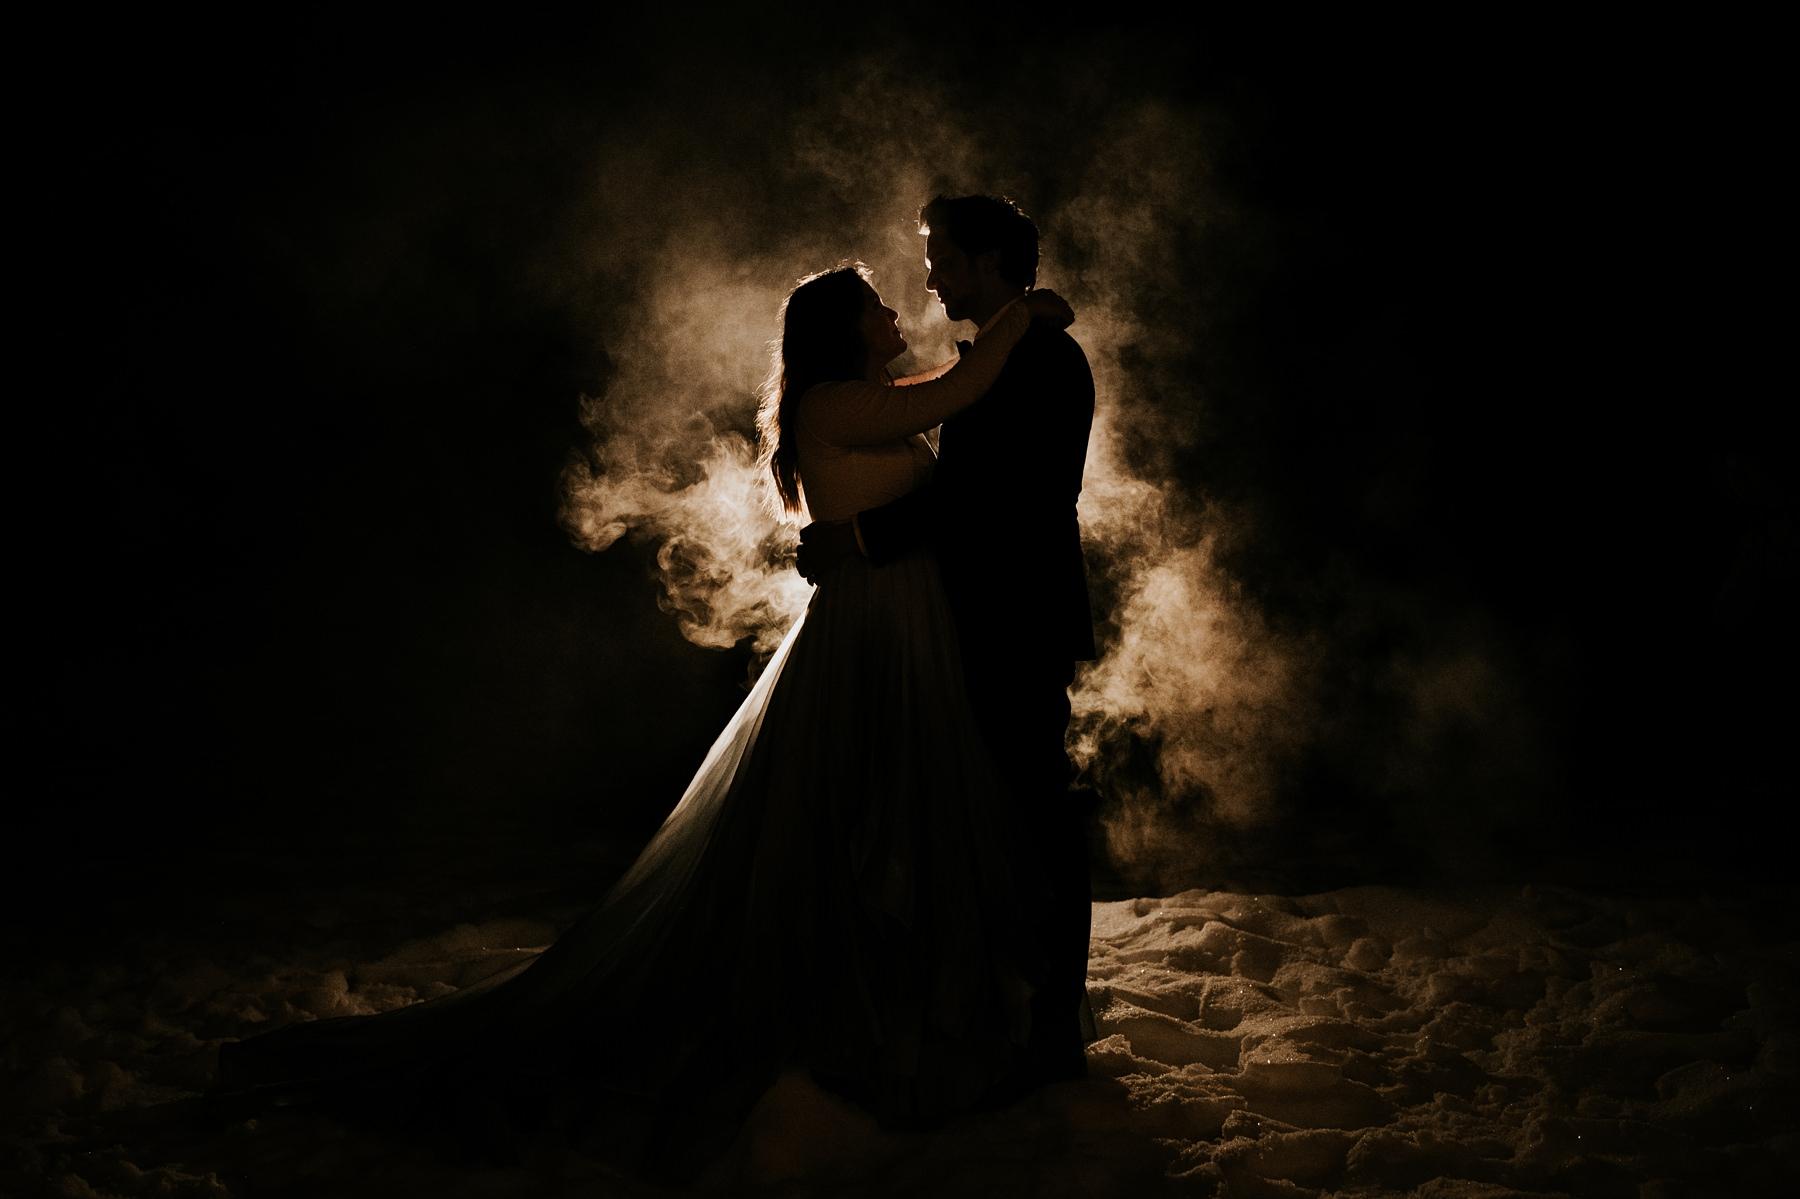 bride and groom in atmosphere night photo